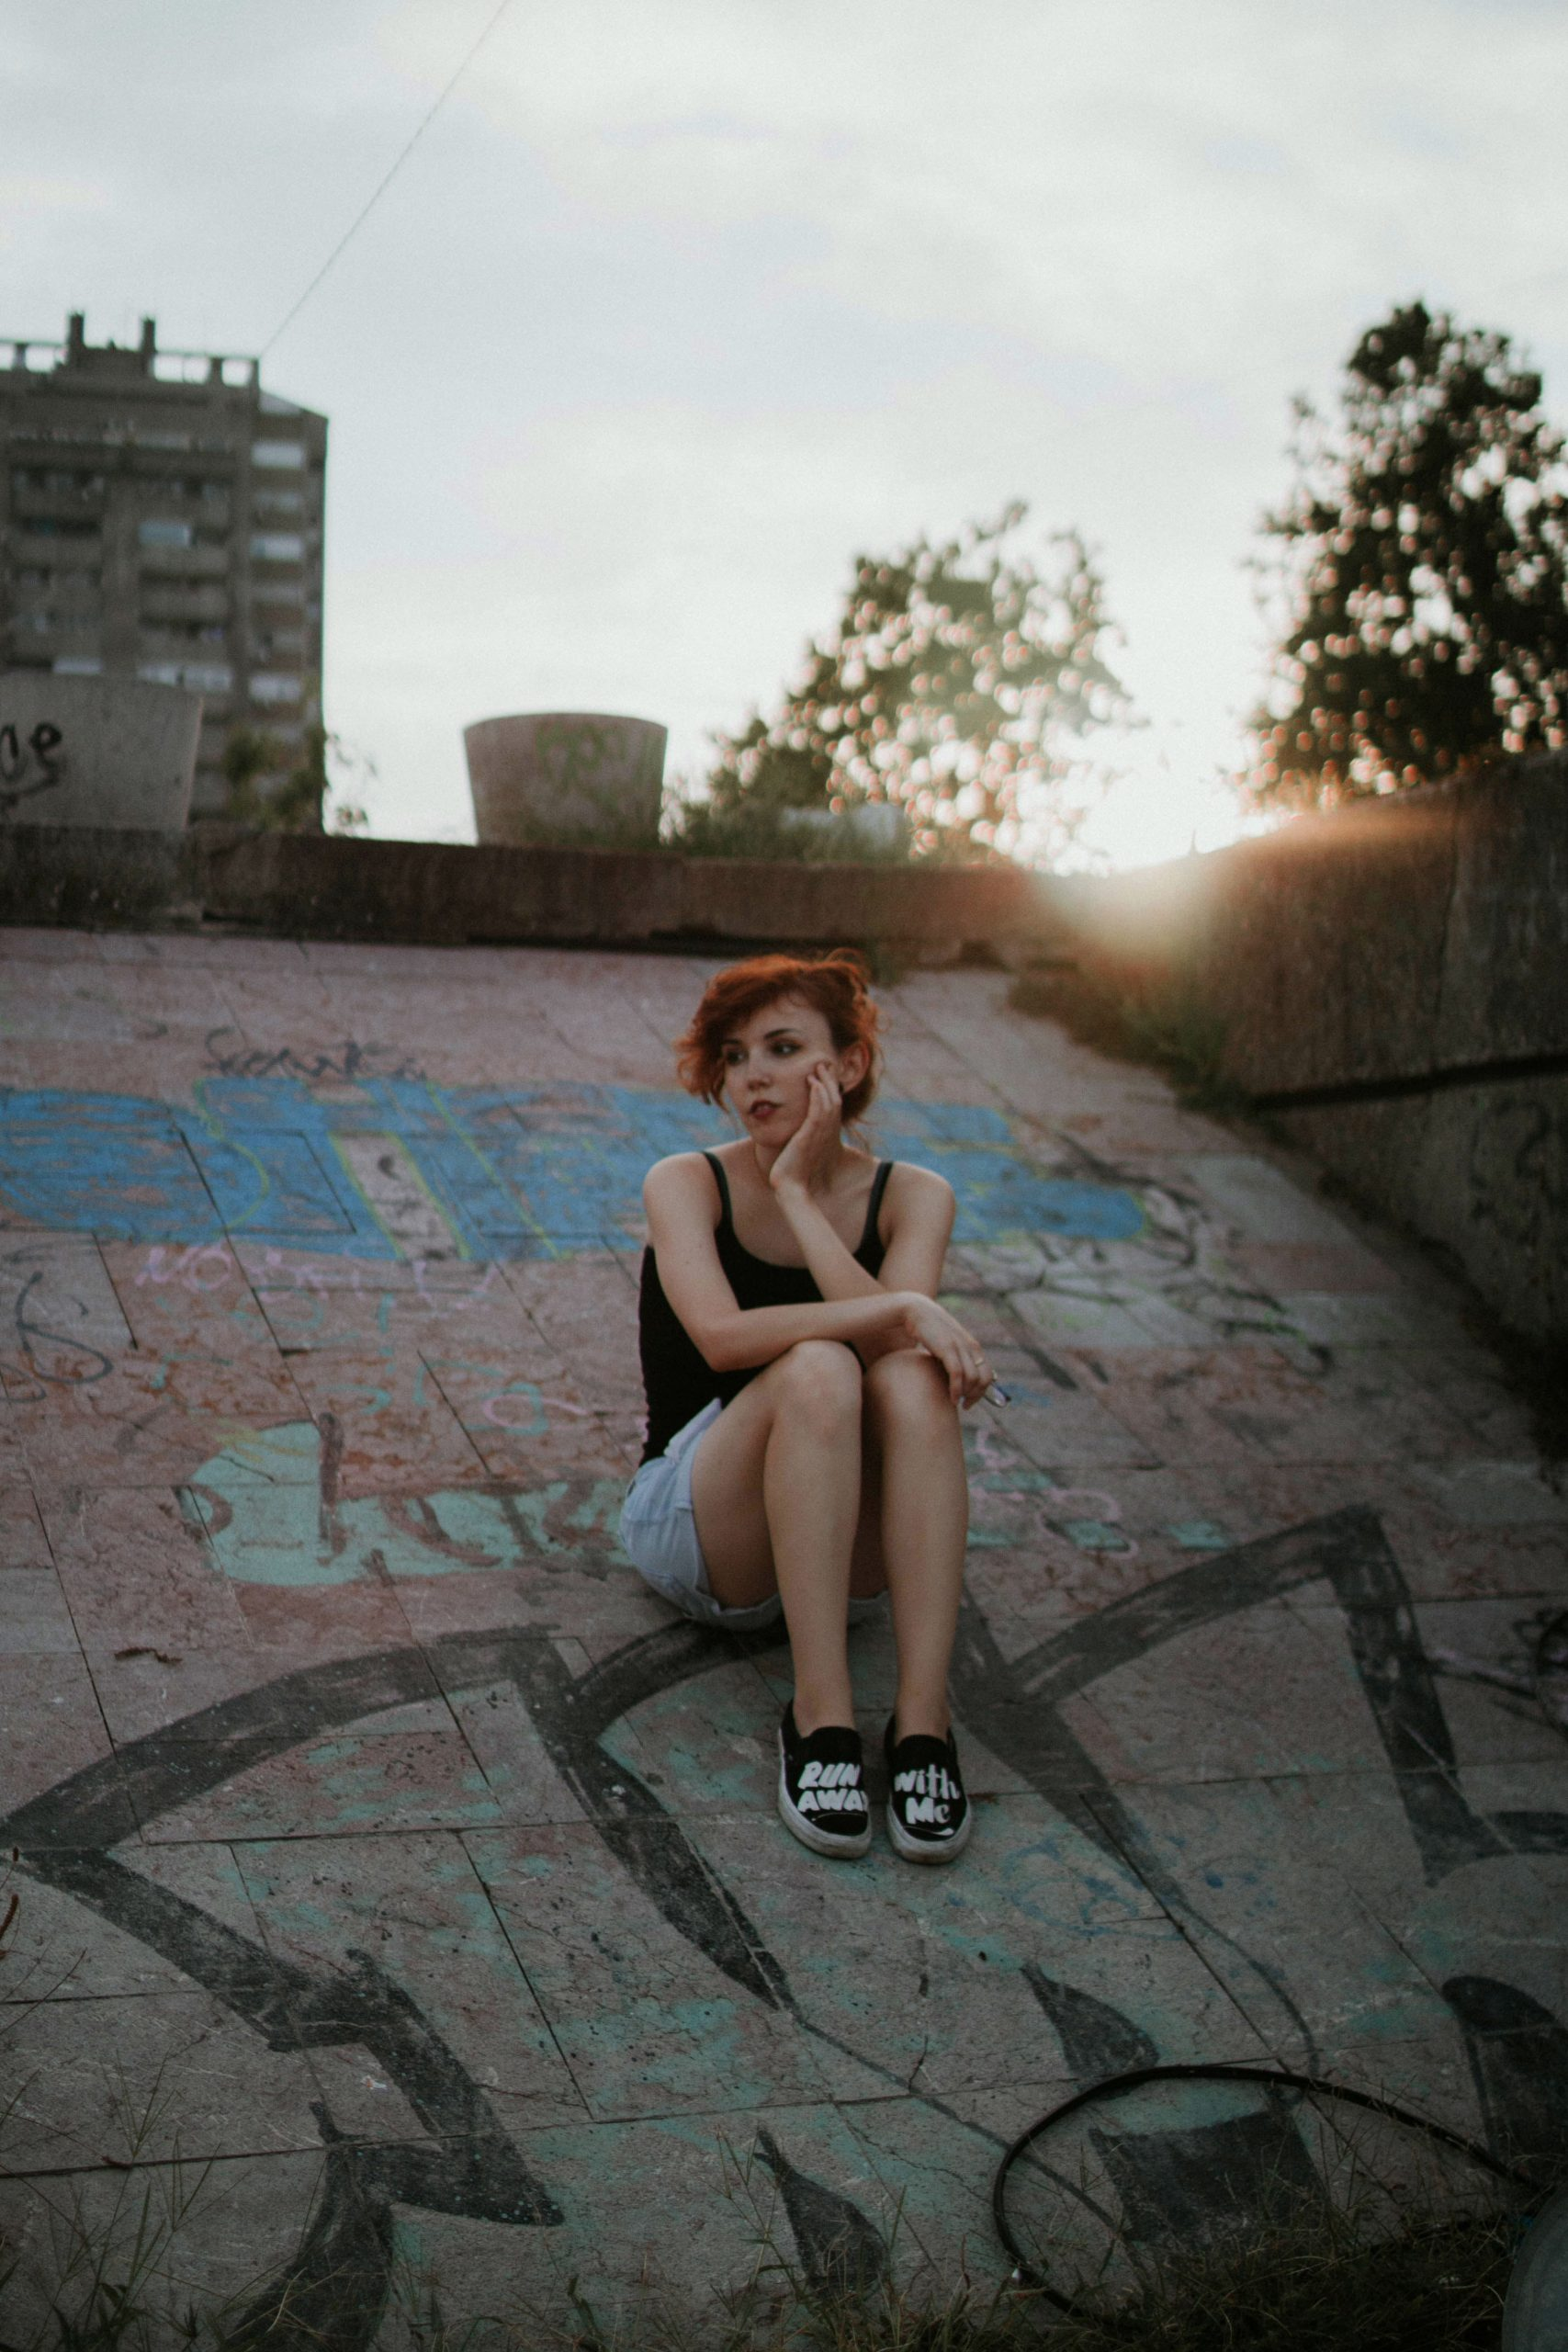 hd Sad Girl Whatsapp Dp Images photo